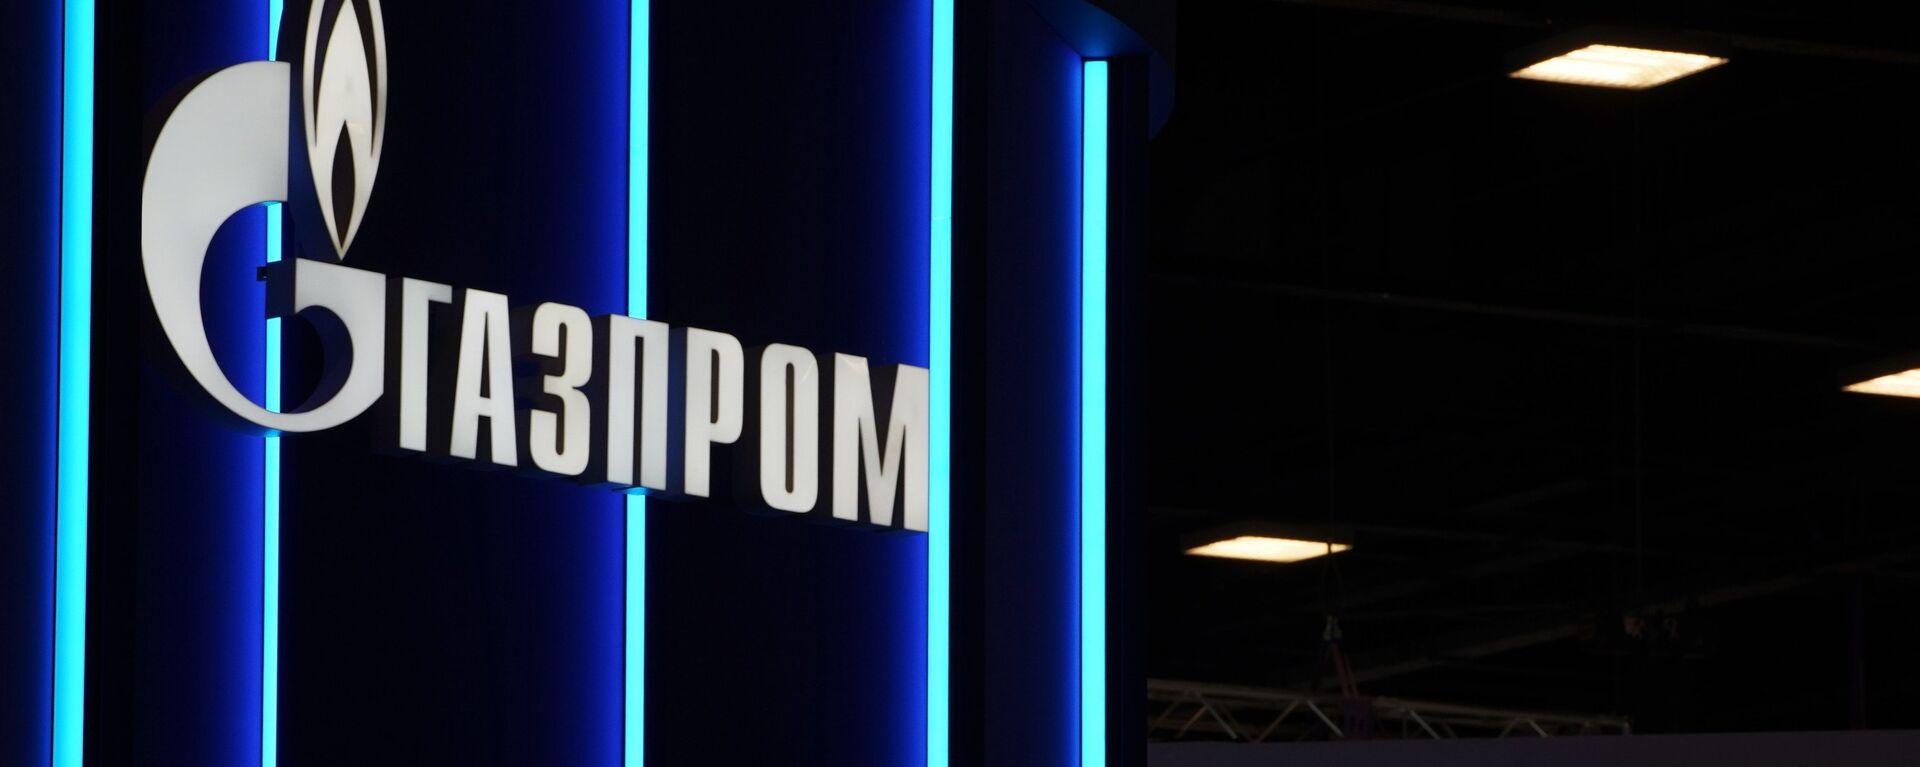 Logo de Gazprom - Sputnik Mundo, 1920, 02.04.2021